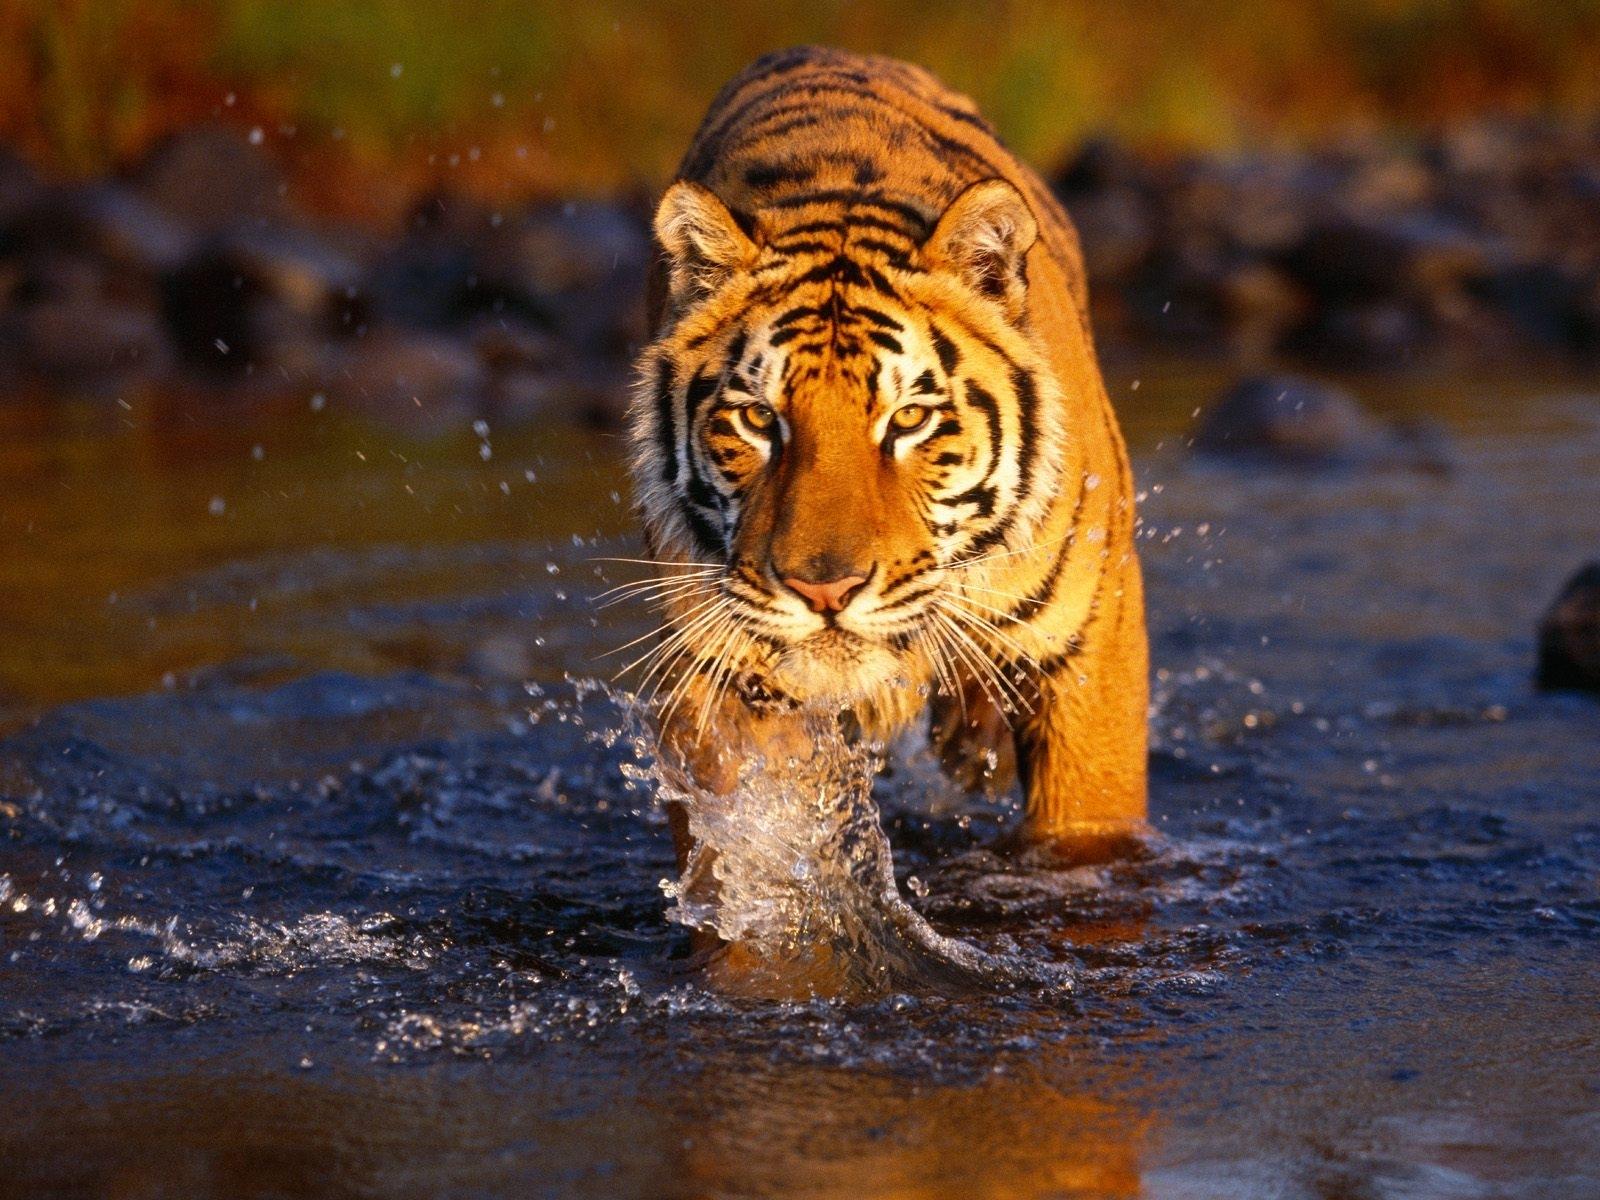 japan: tigers hd wallpapers, tiger wallpaper for desktop backgrounds